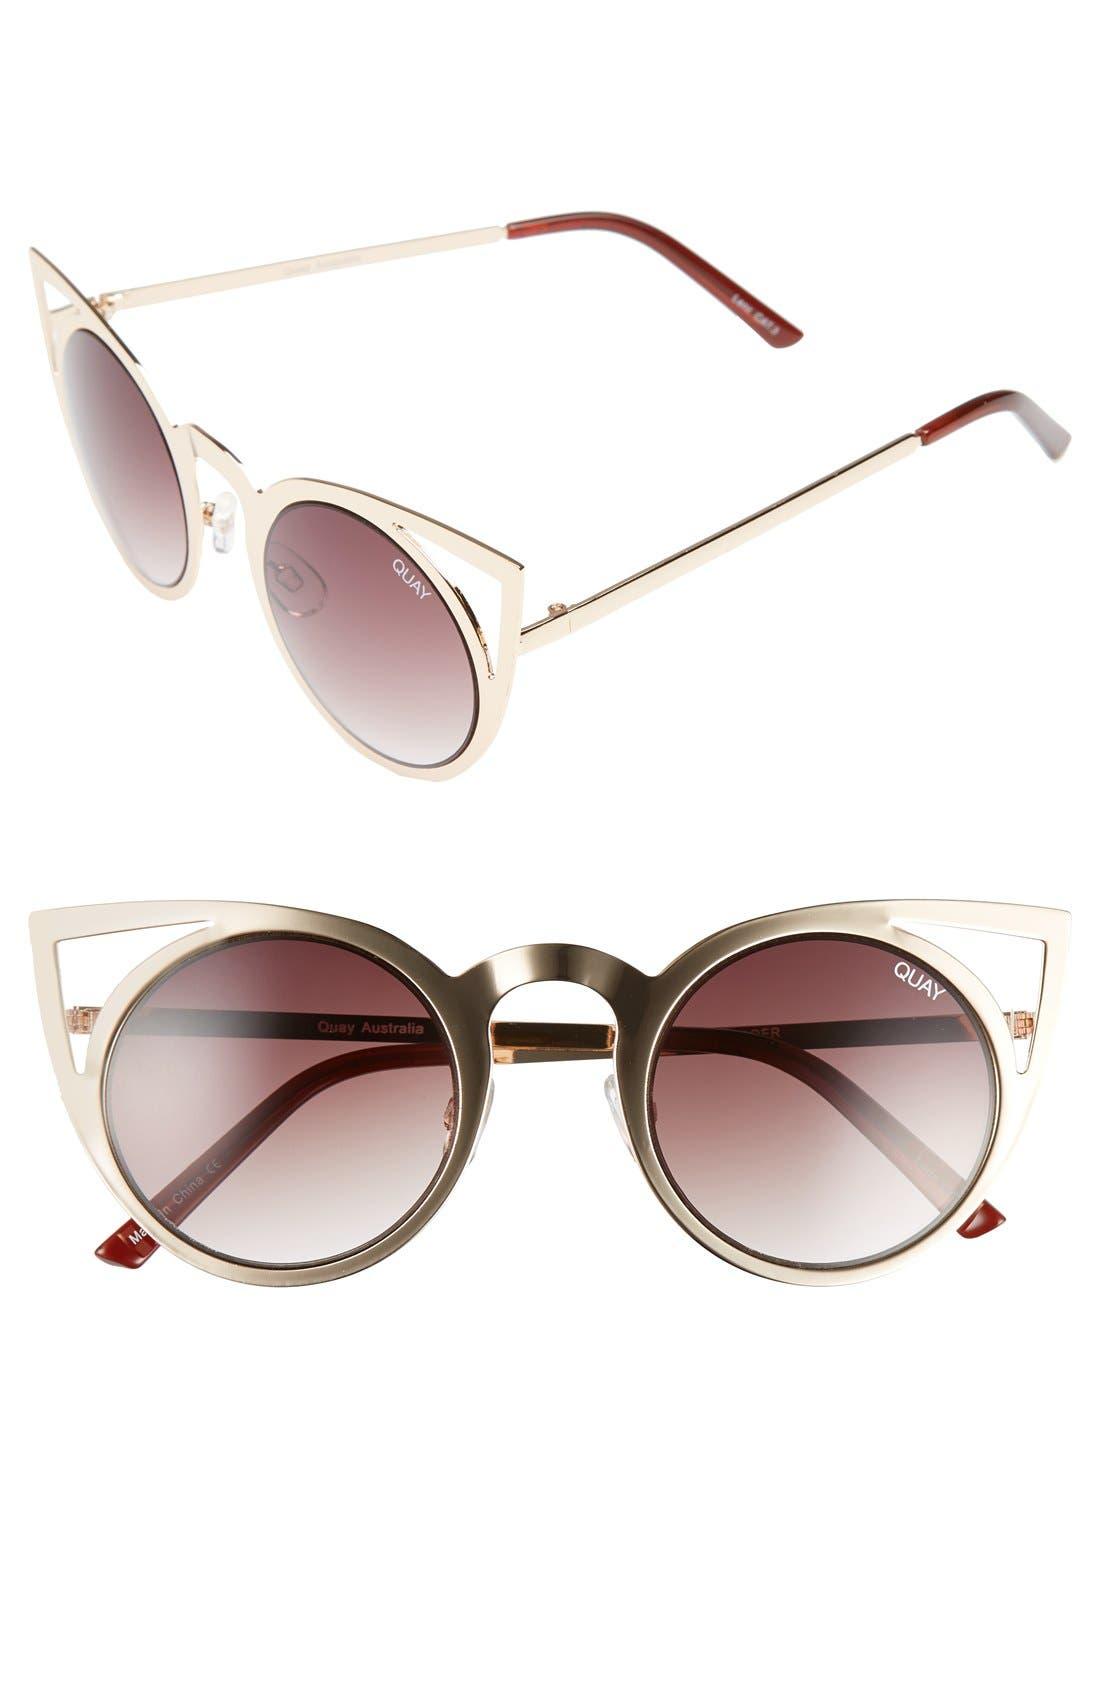 Alternate Image 1 Selected - Quay Australia 'Invader' 50mm Cat Eye Sunglasses